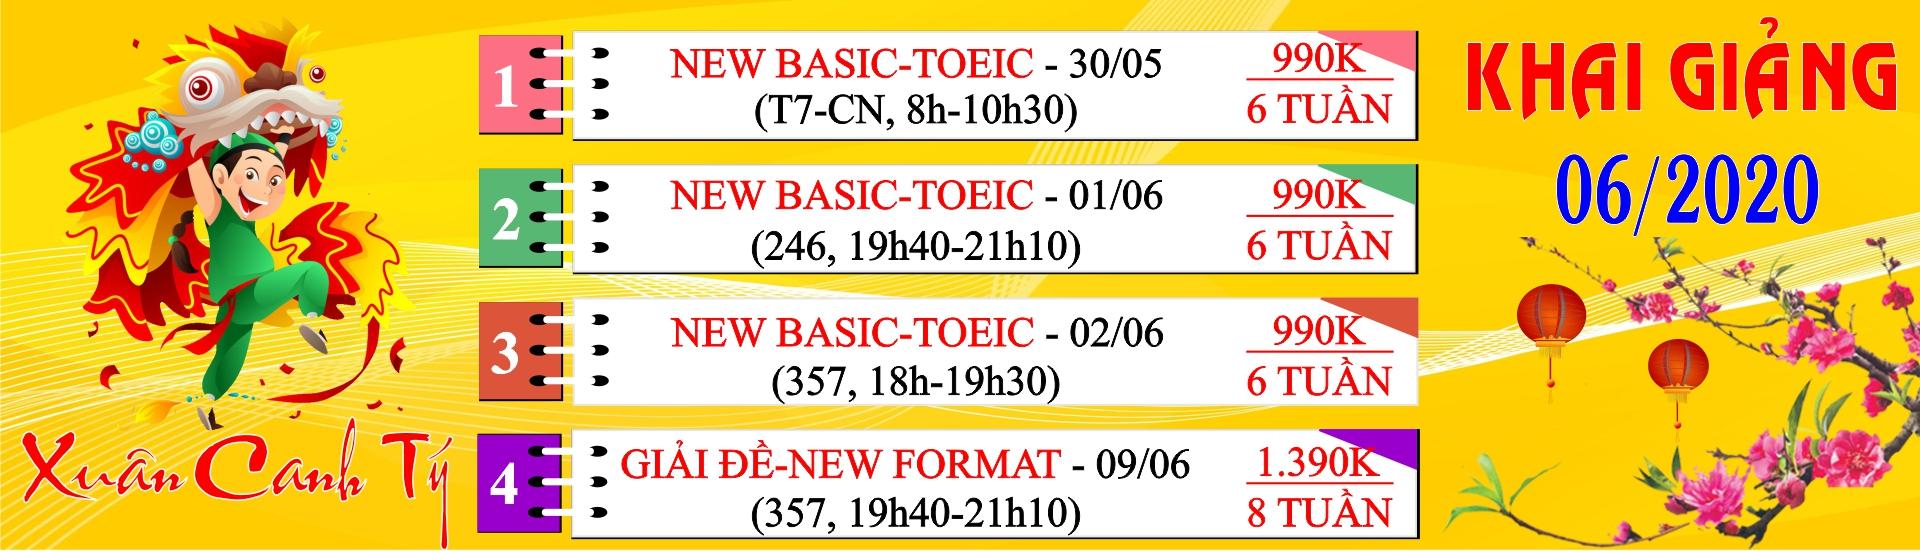 khai-giang-khoa-hoc-toeic-new-format-06-2020